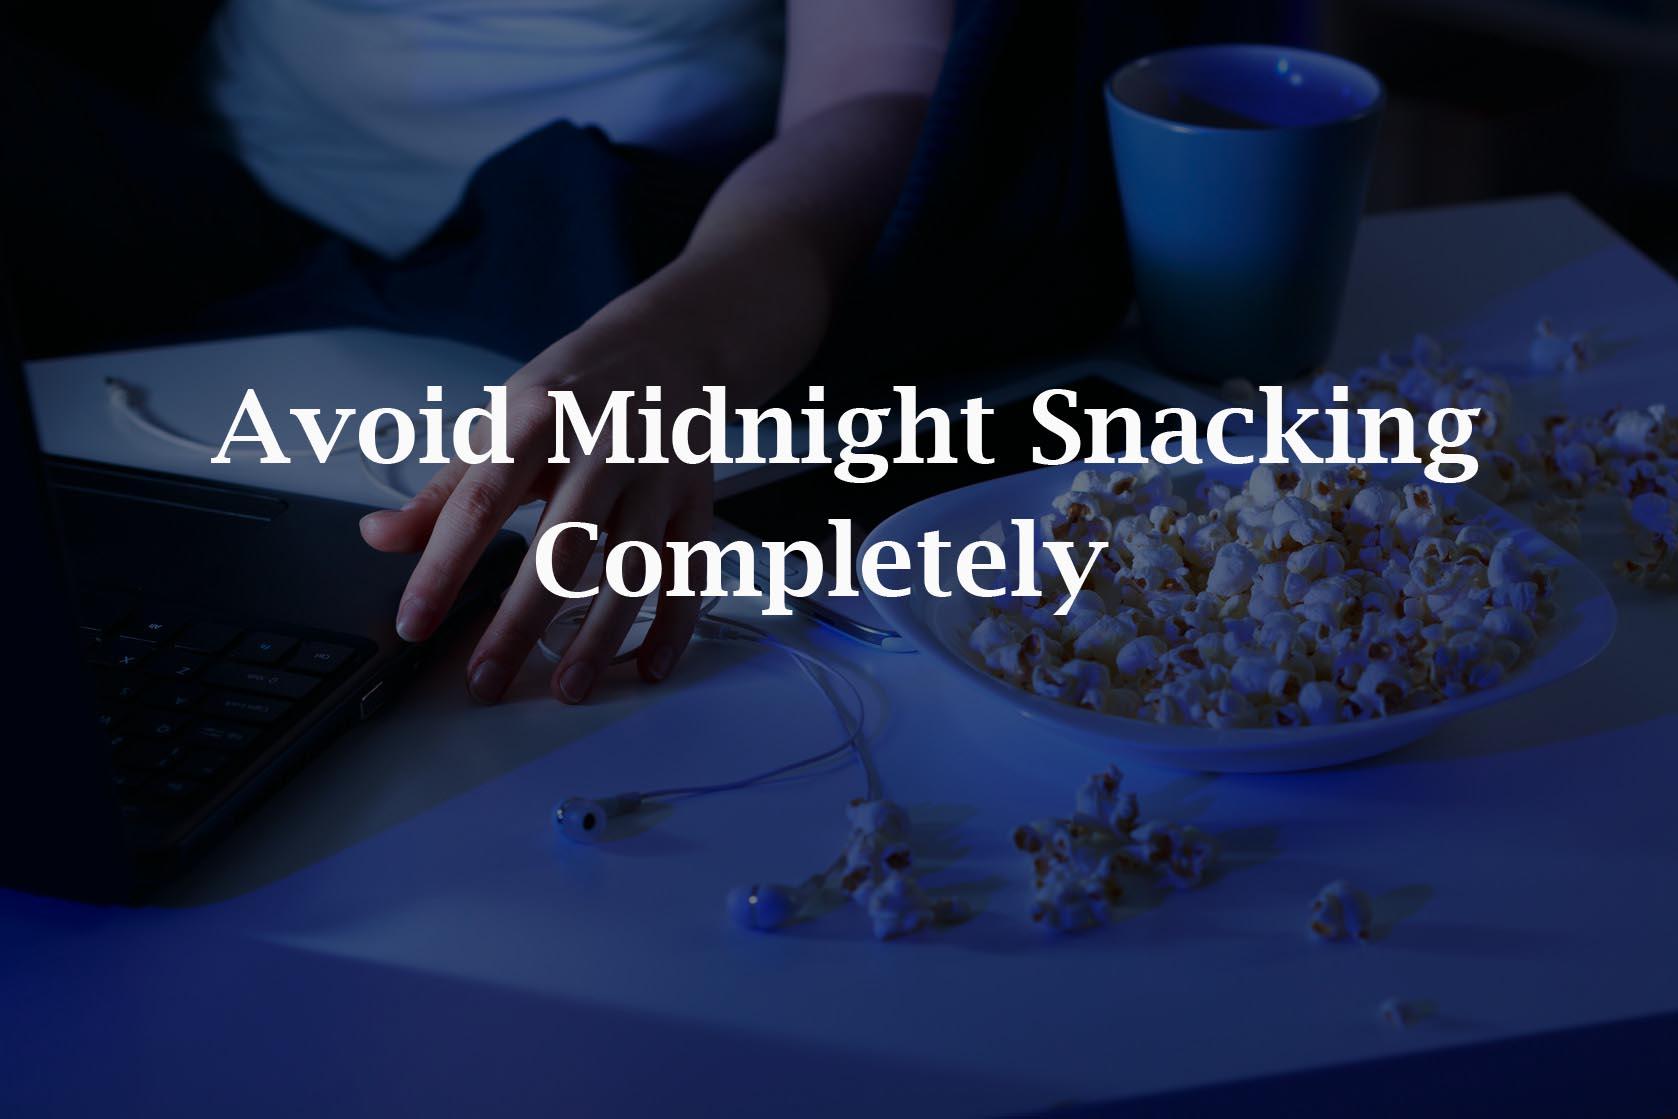 Avoid Midnight Snacking Completely